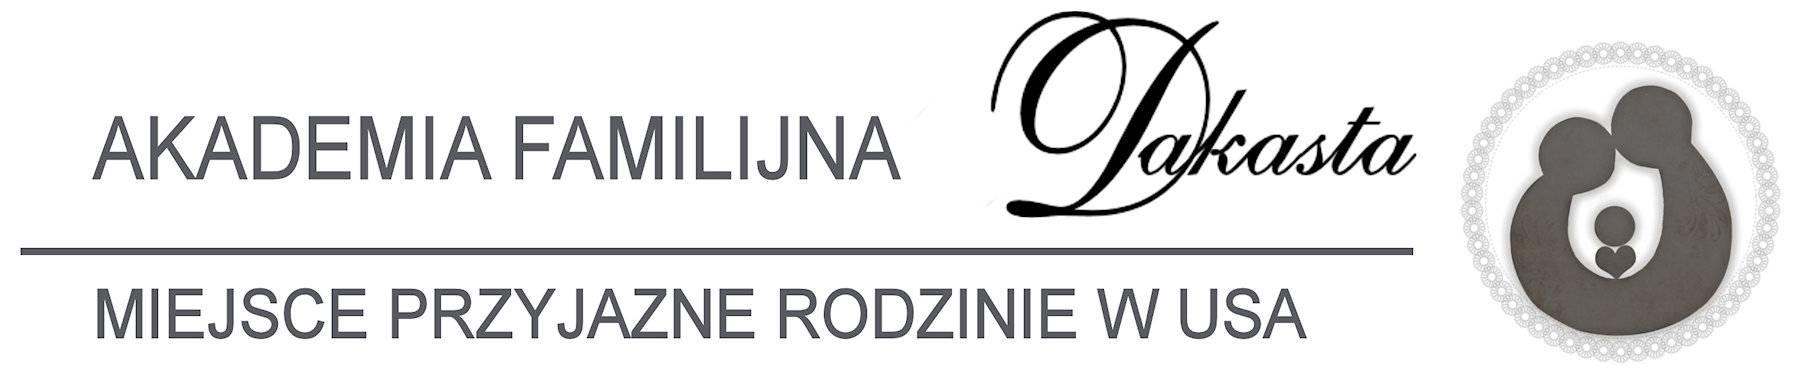 dakasta-logo-03